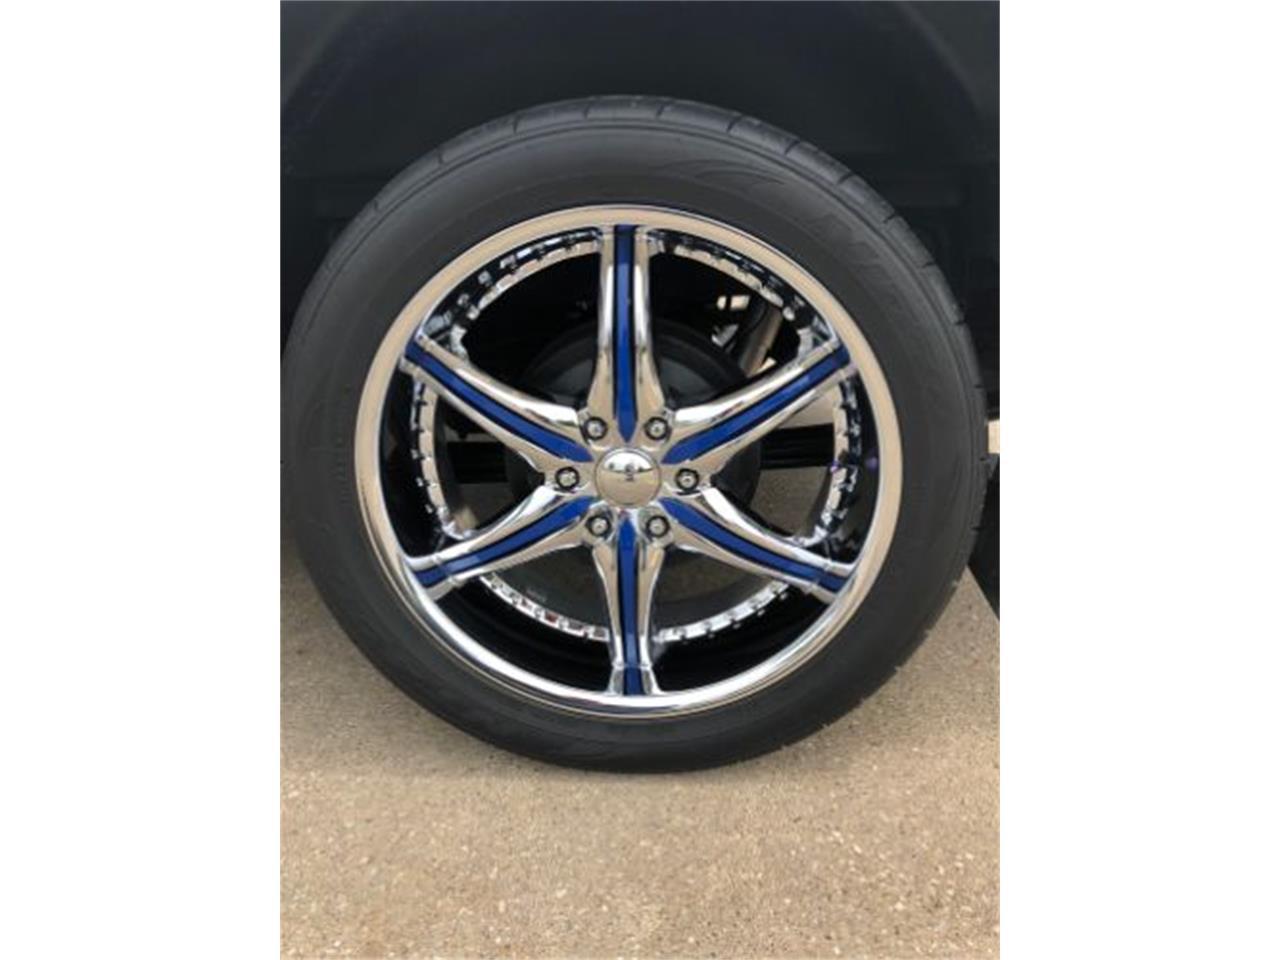 2011 Chevrolet Silverado (CC-1417990) for sale in Cadillac, Michigan